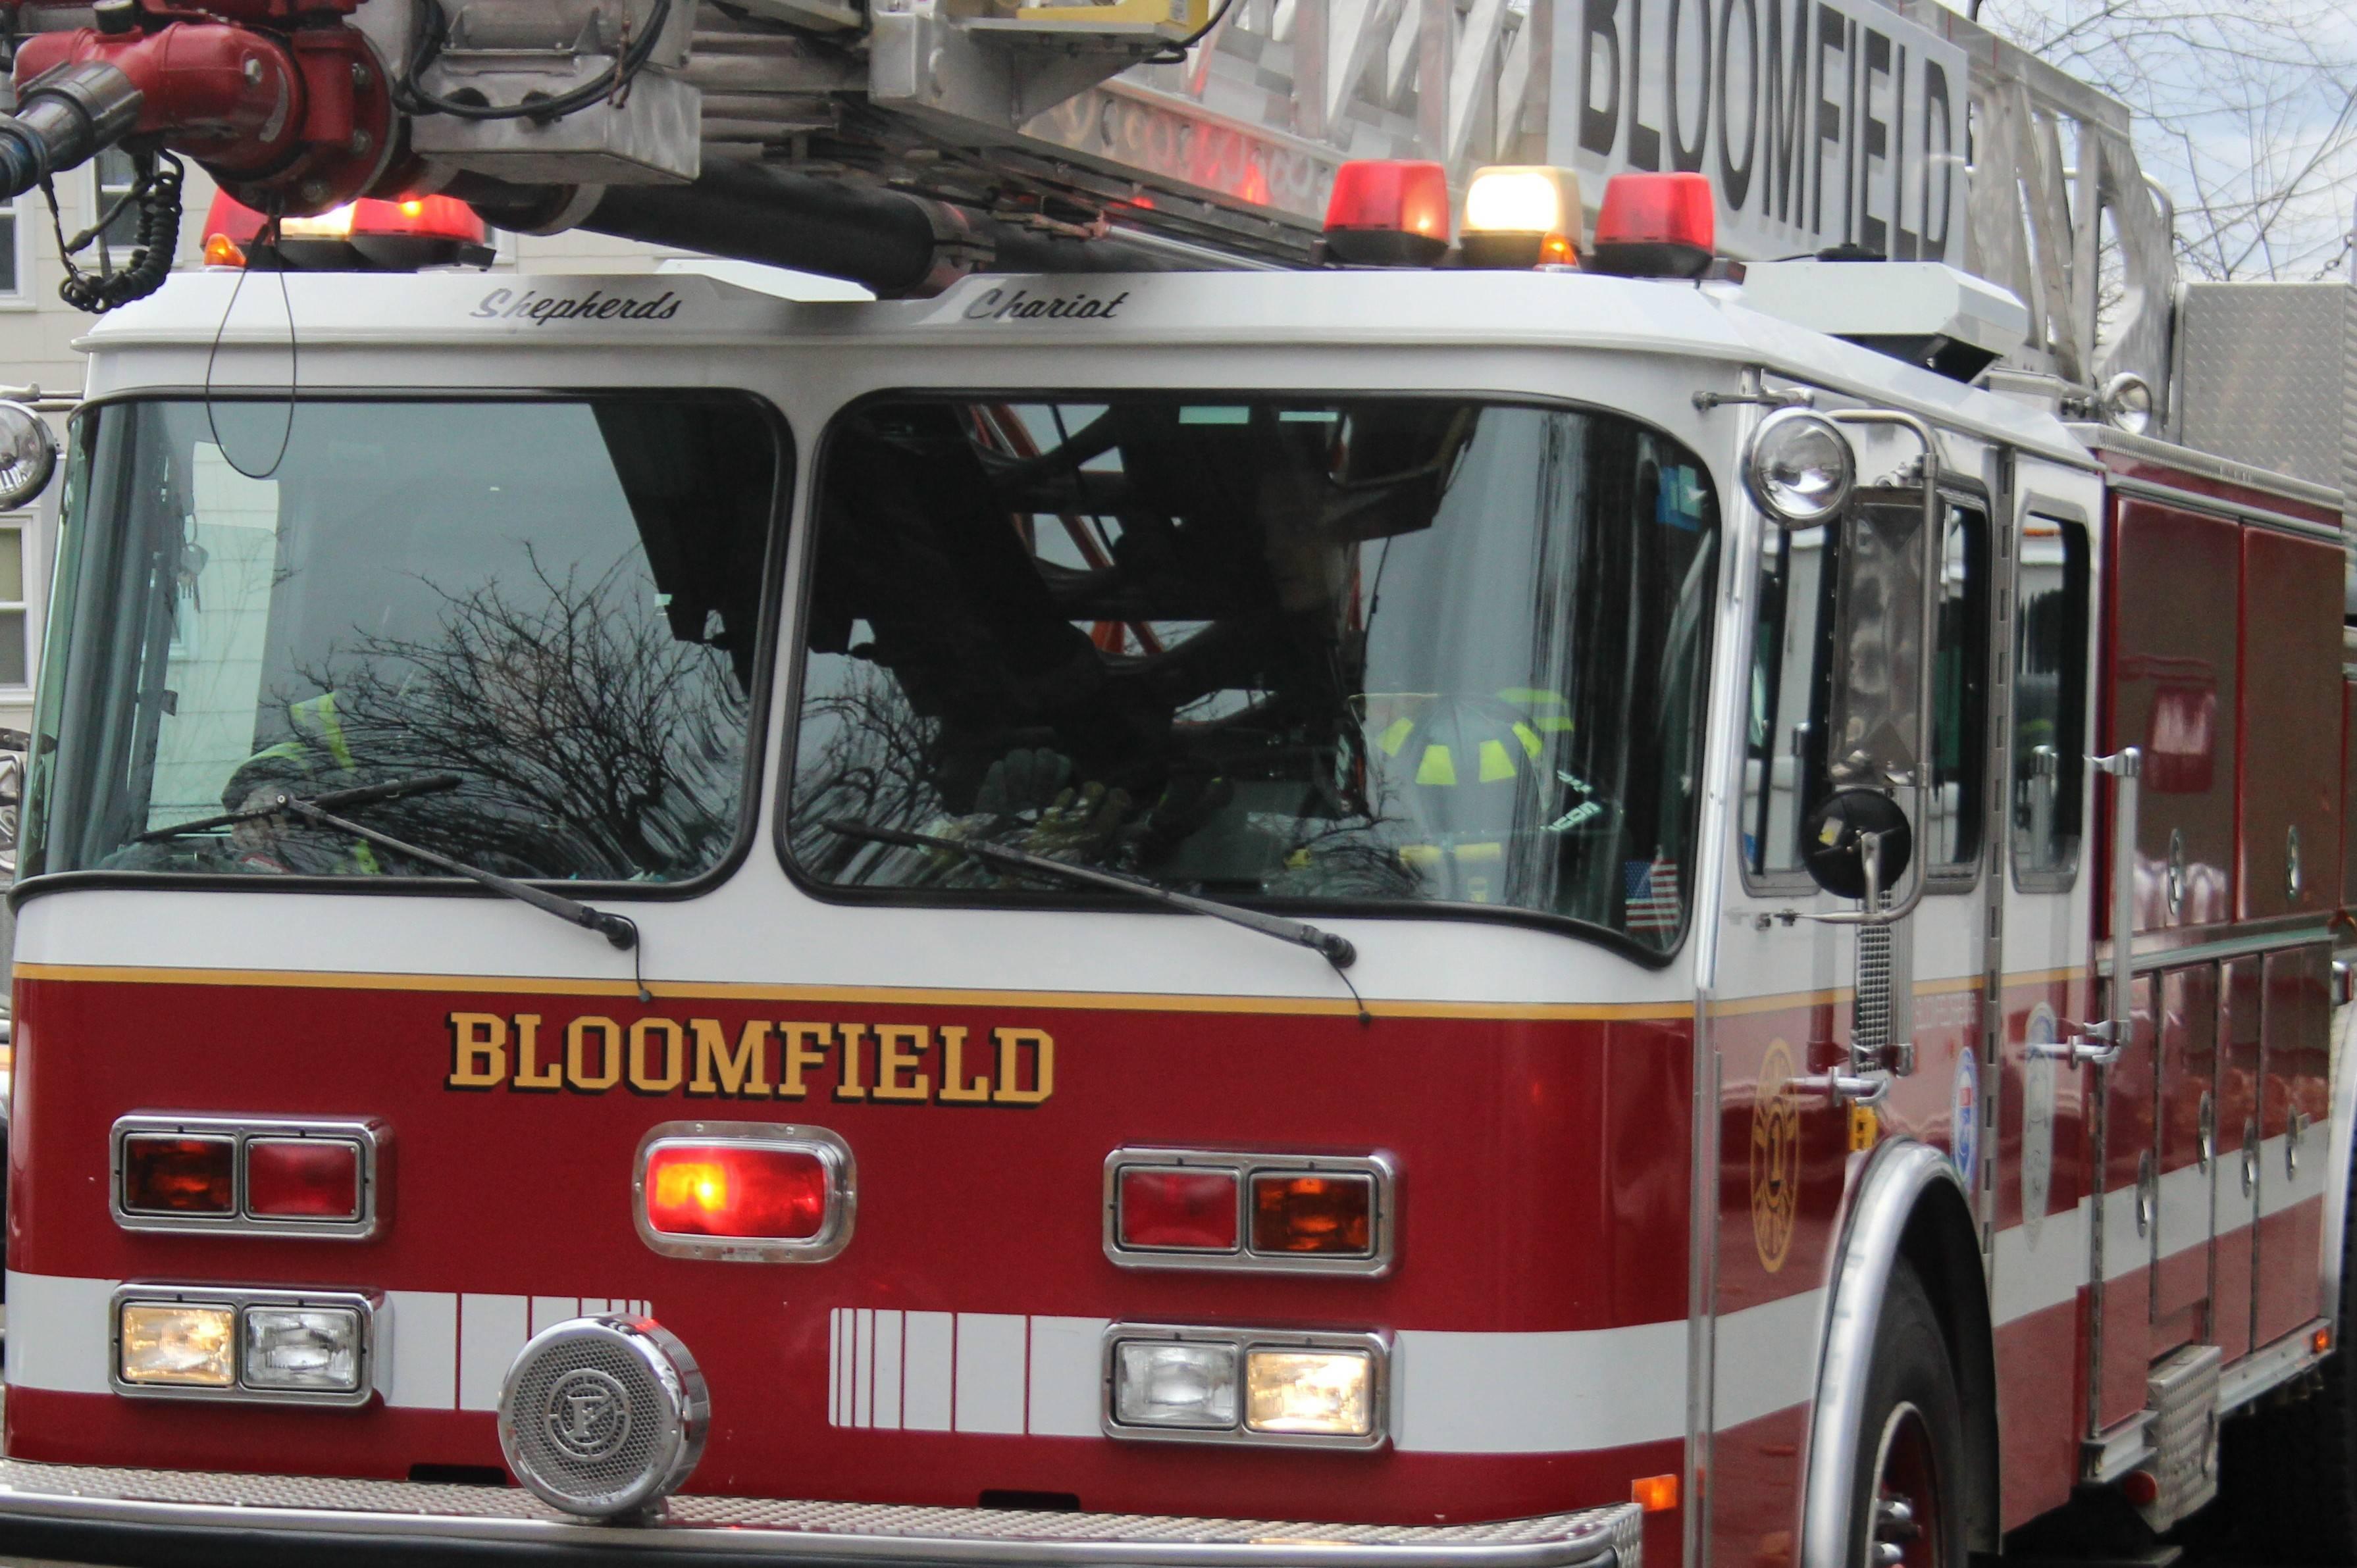 bac220fe69eae9ef9901_Nissan_Murano_Bloomfield_Fire_Department_Training_027.jpg